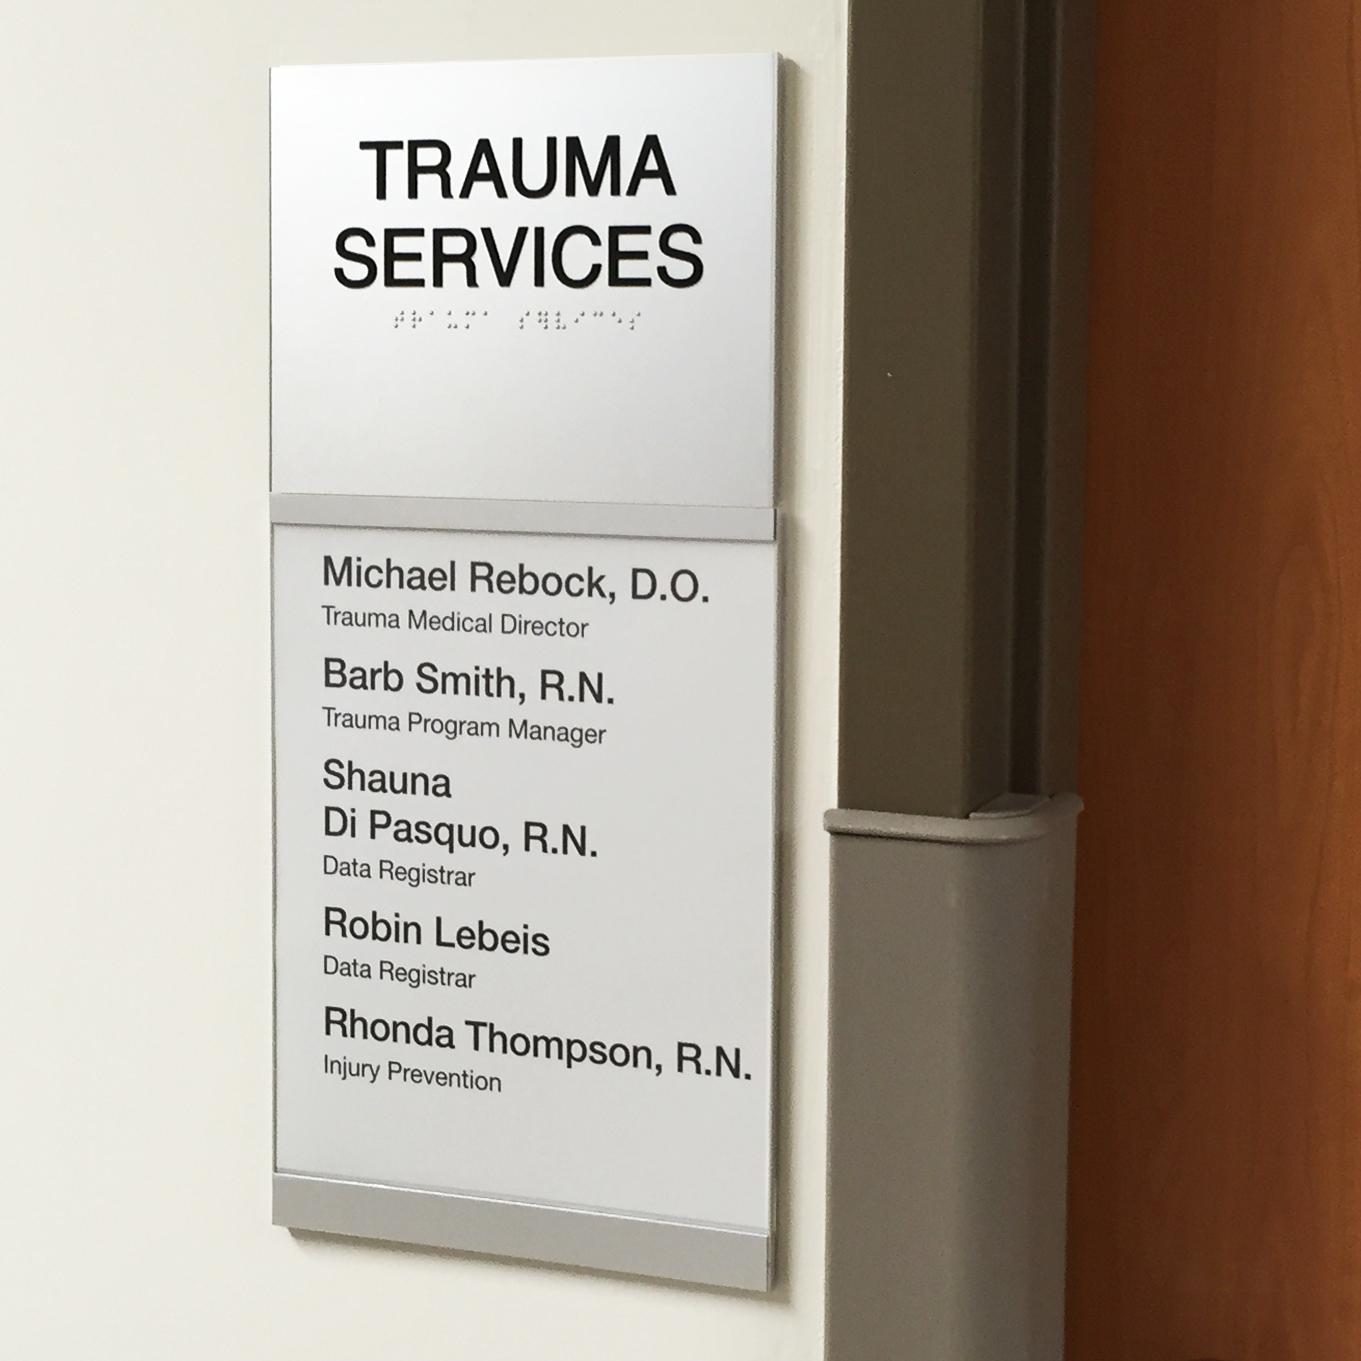 EPICS- Trauma.jpg